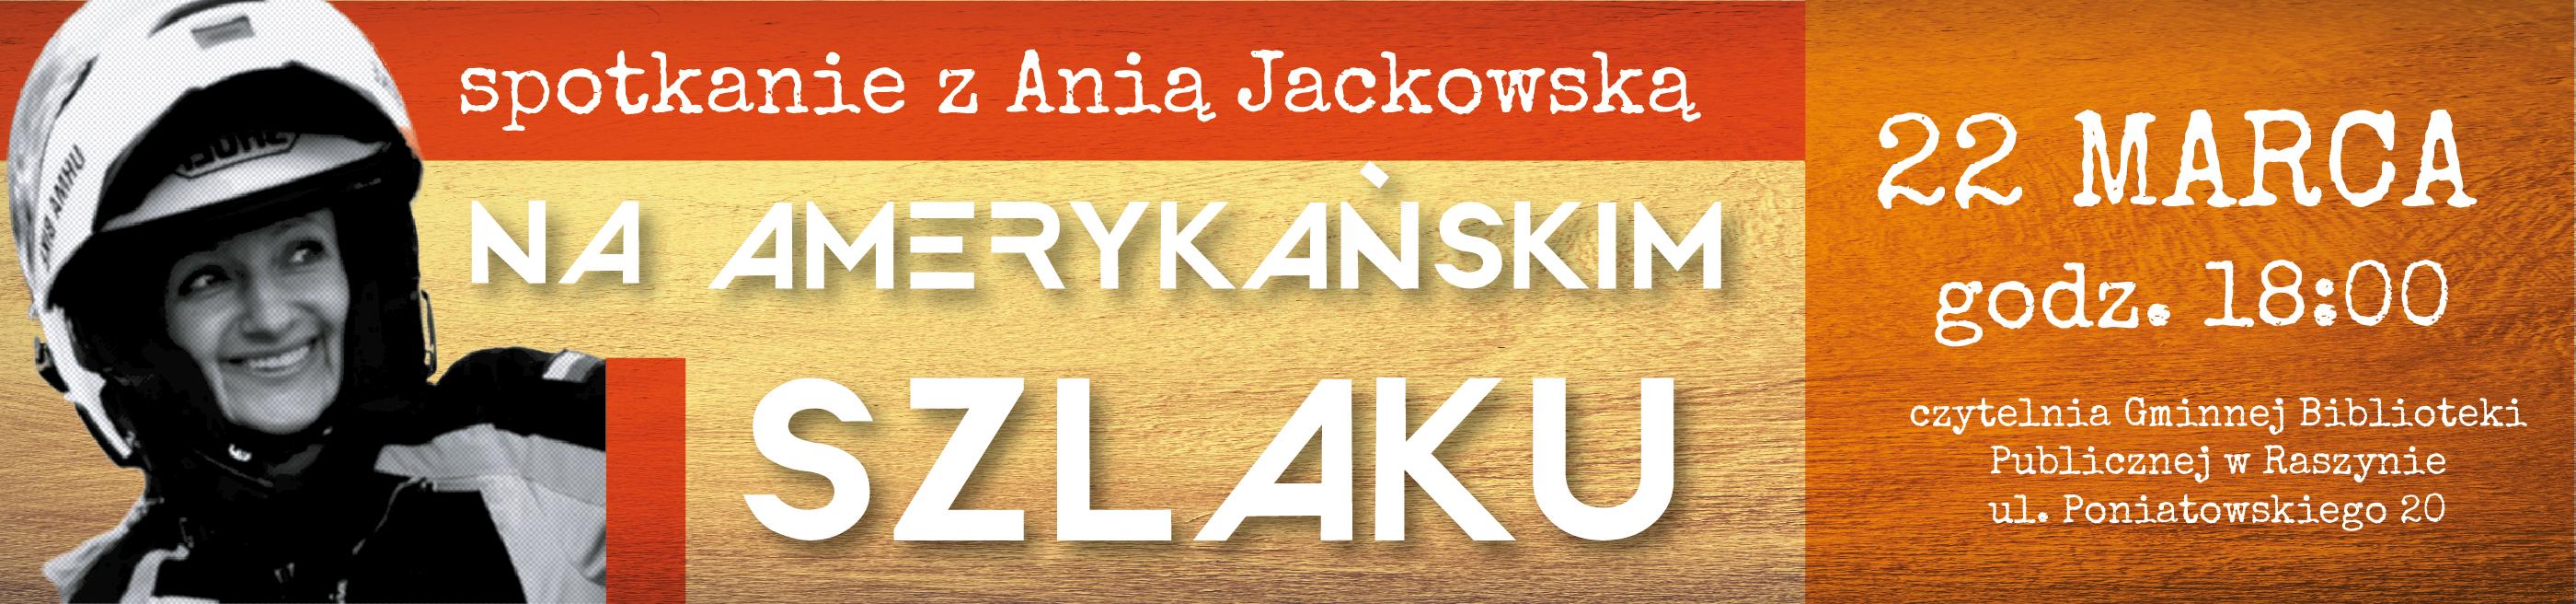 anna-jackowska